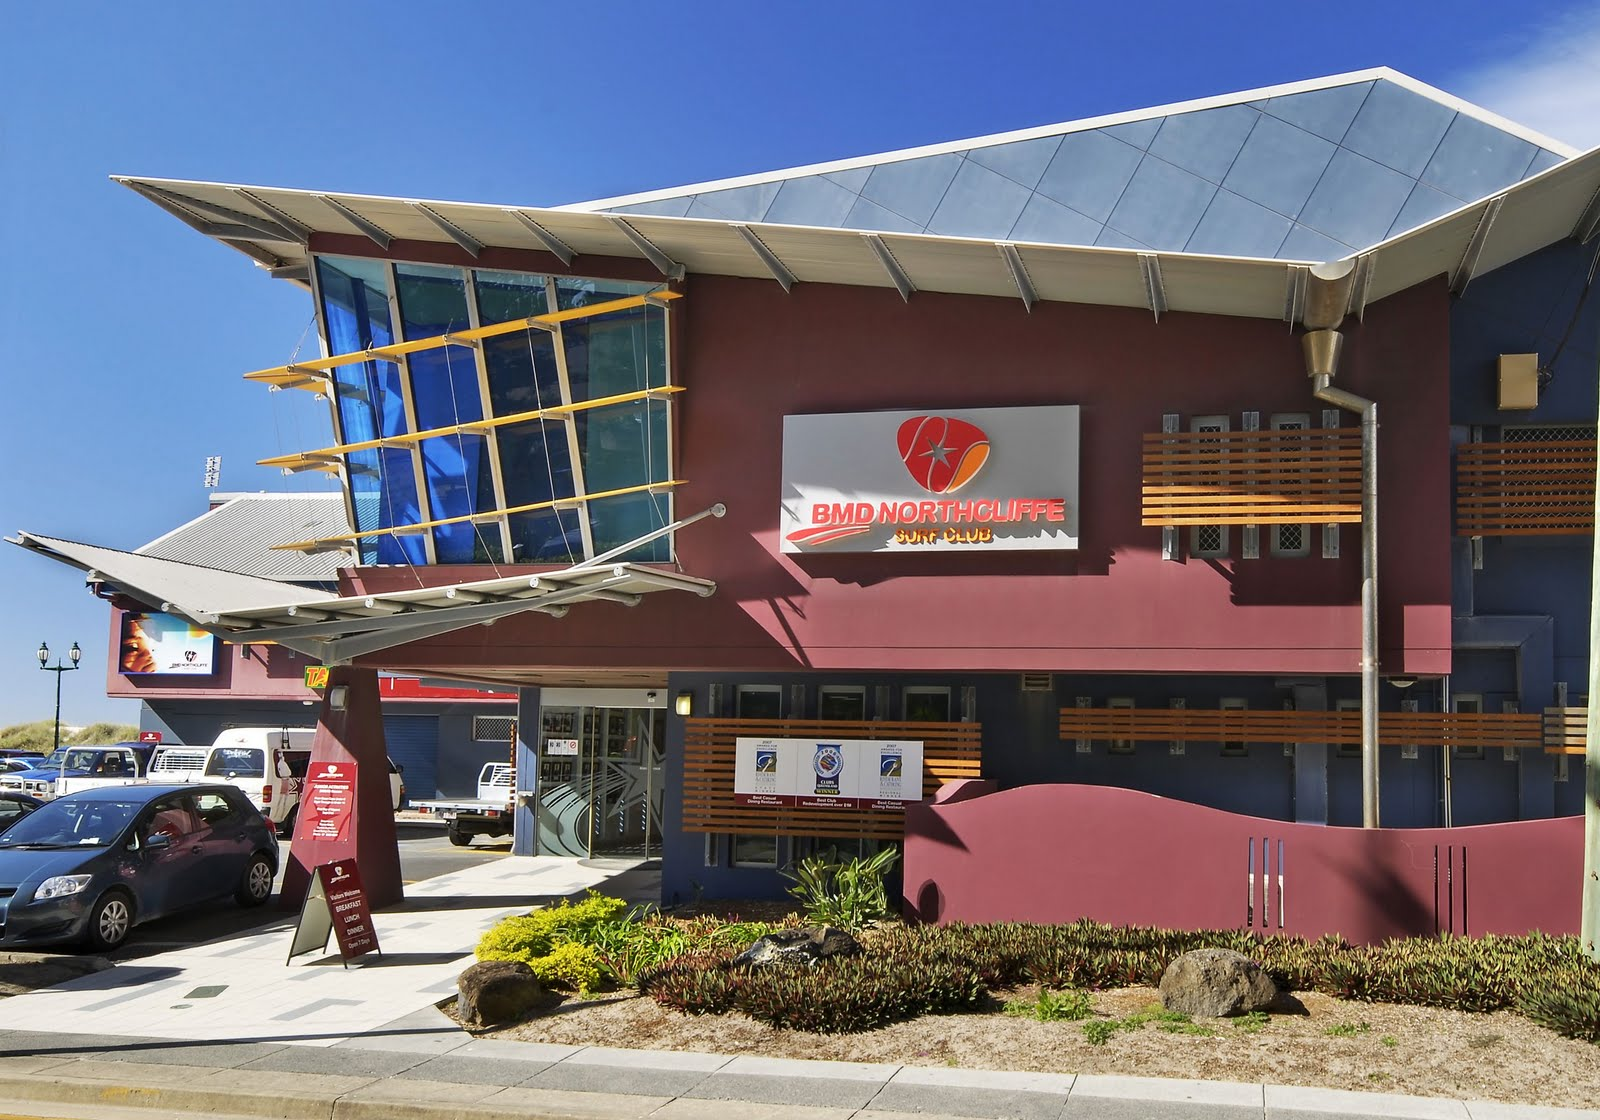 Gold Coast Surf Club Restaurants